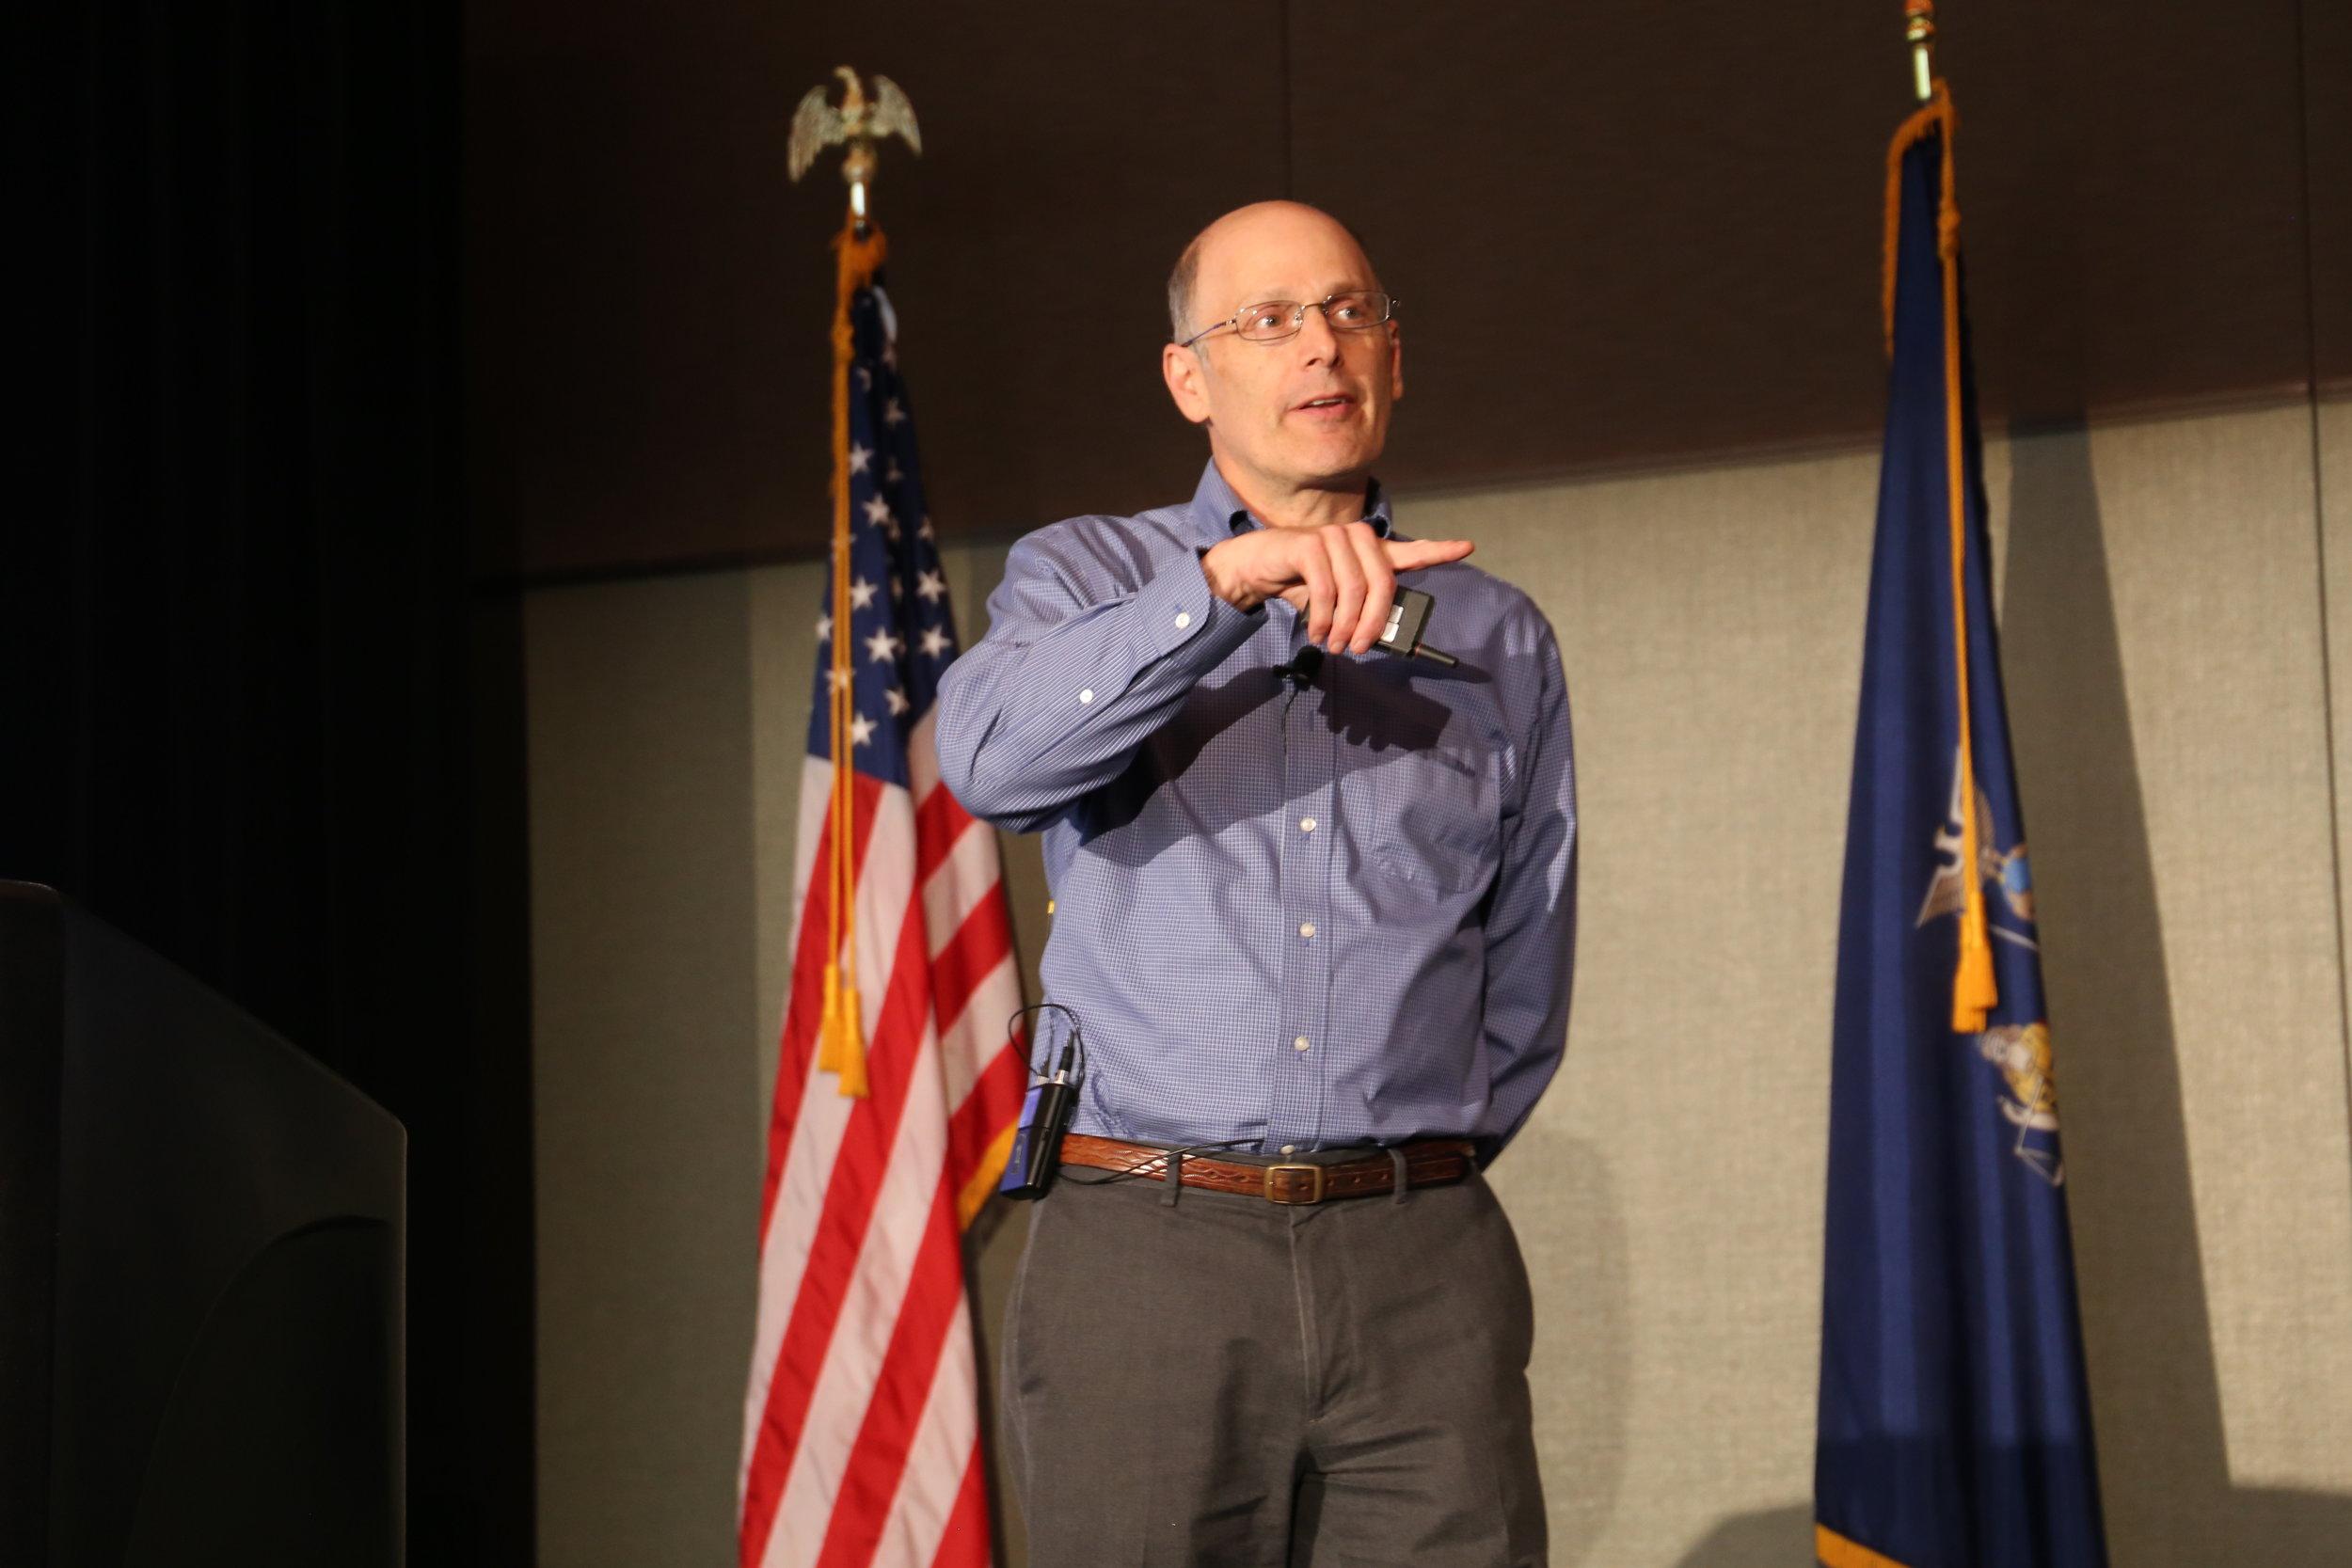 Dr. Jacob Reider, CEO, Alliance for Better Health